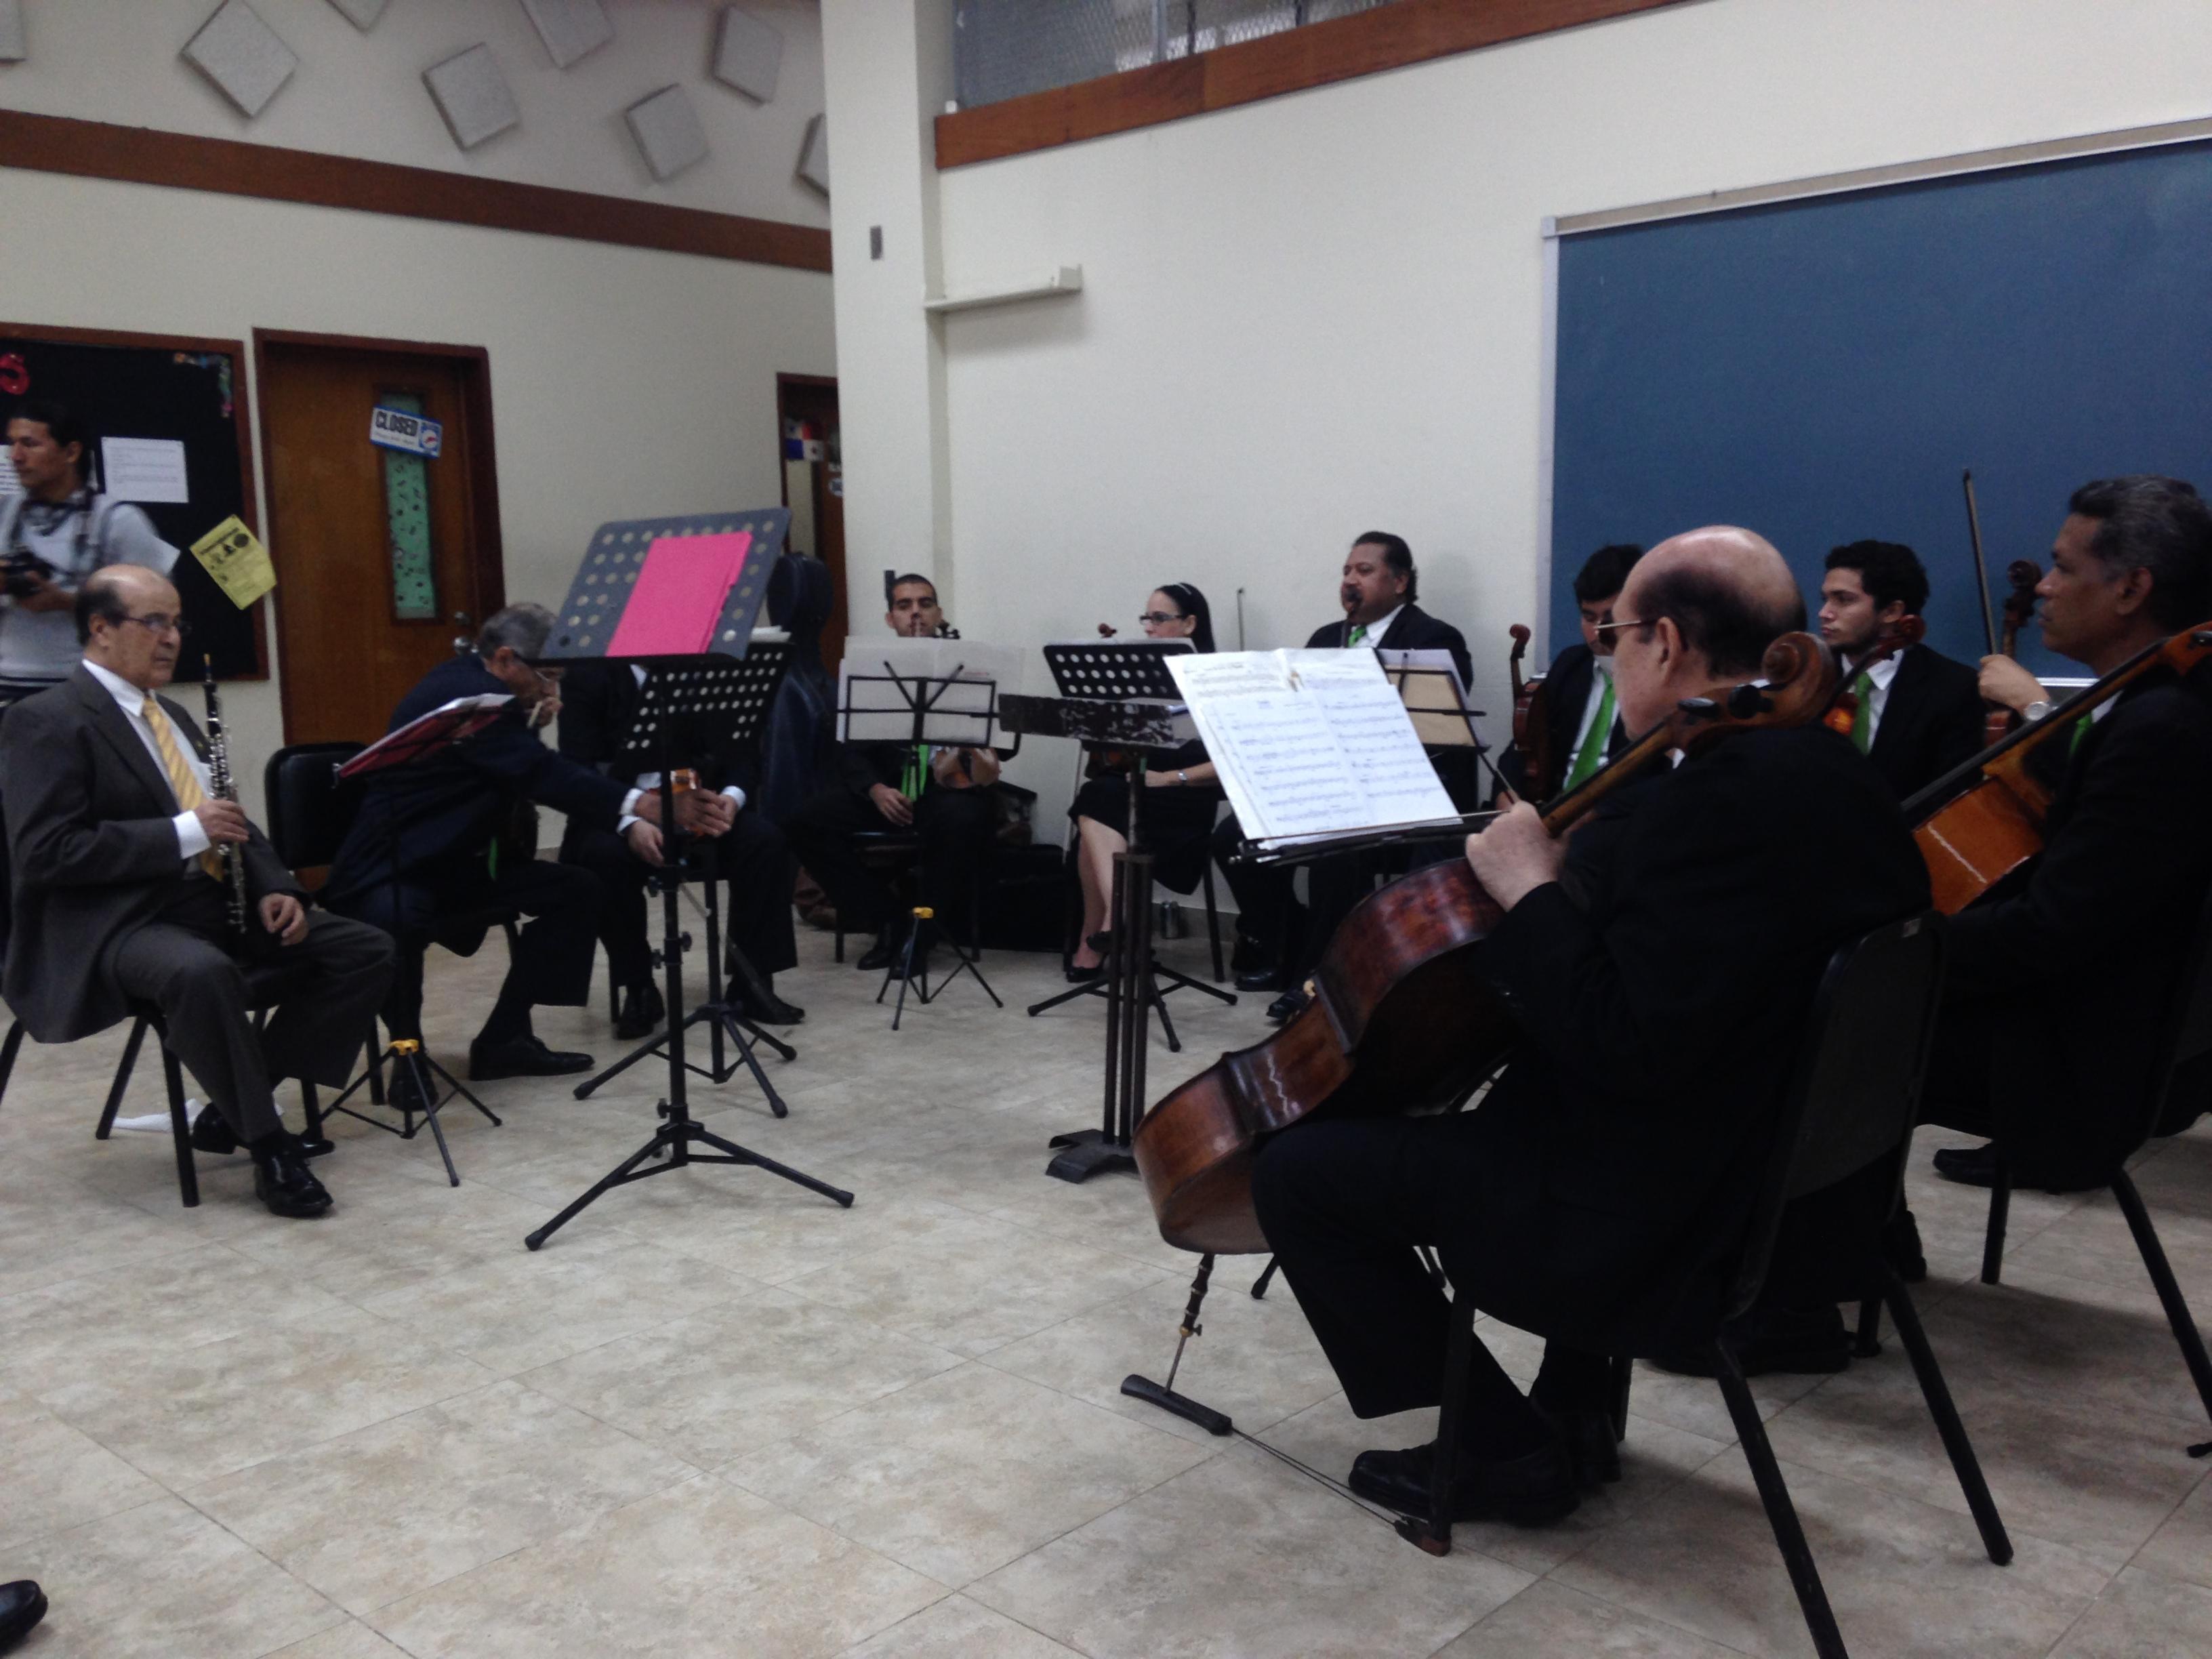 Presentación de Temas Musicales